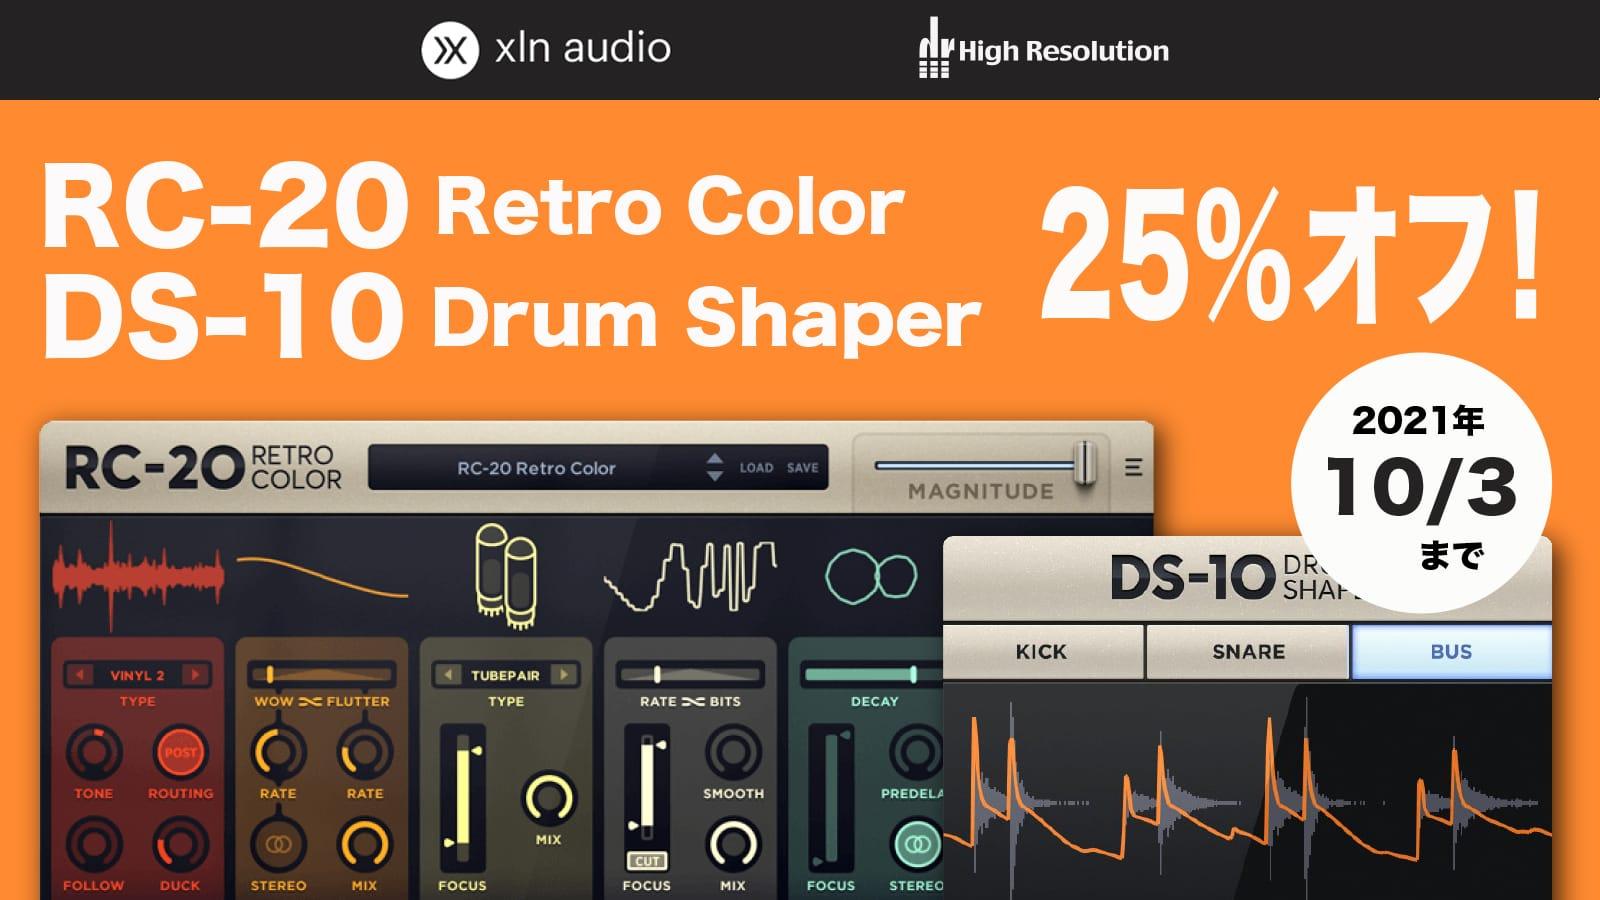 XLN Audioの「RC-20」「DS-10」が25%オフ